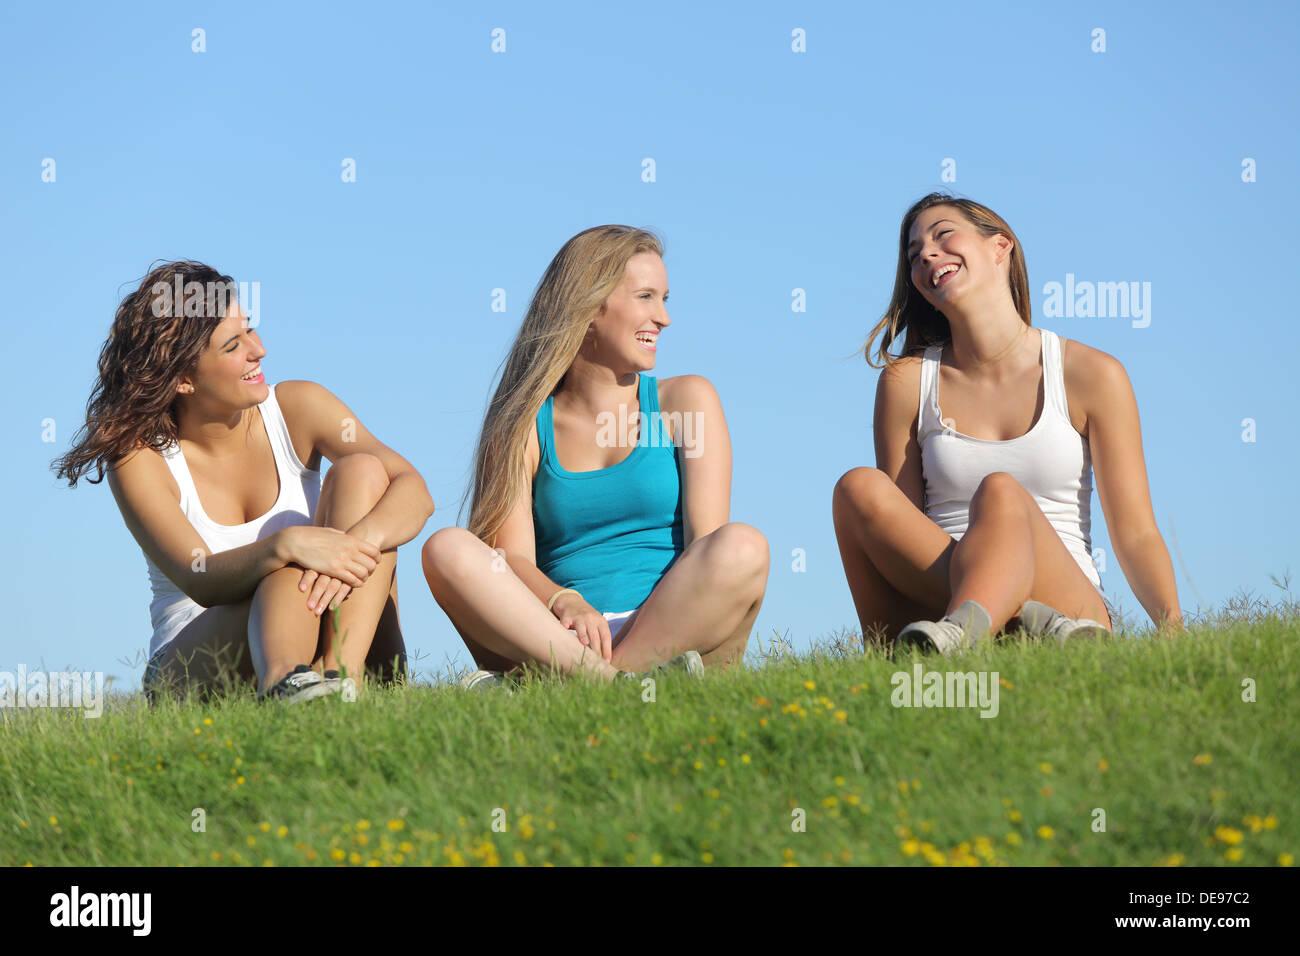 Three teenage girls converse outdoors on a California